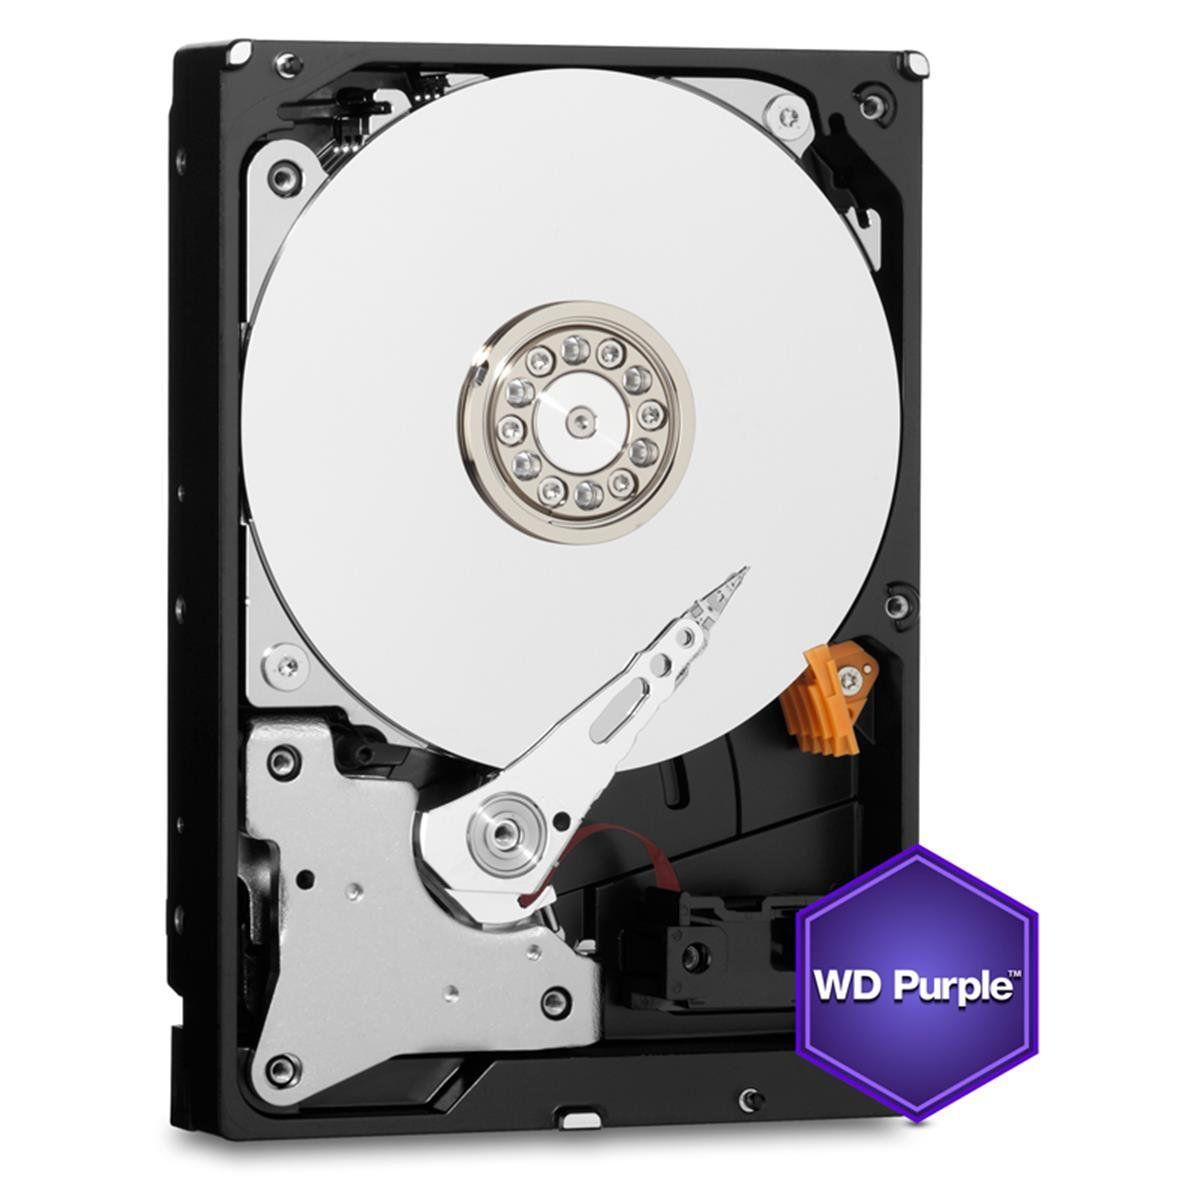 HD WD Purple 2TB para Segurança Vigilancia  DVR